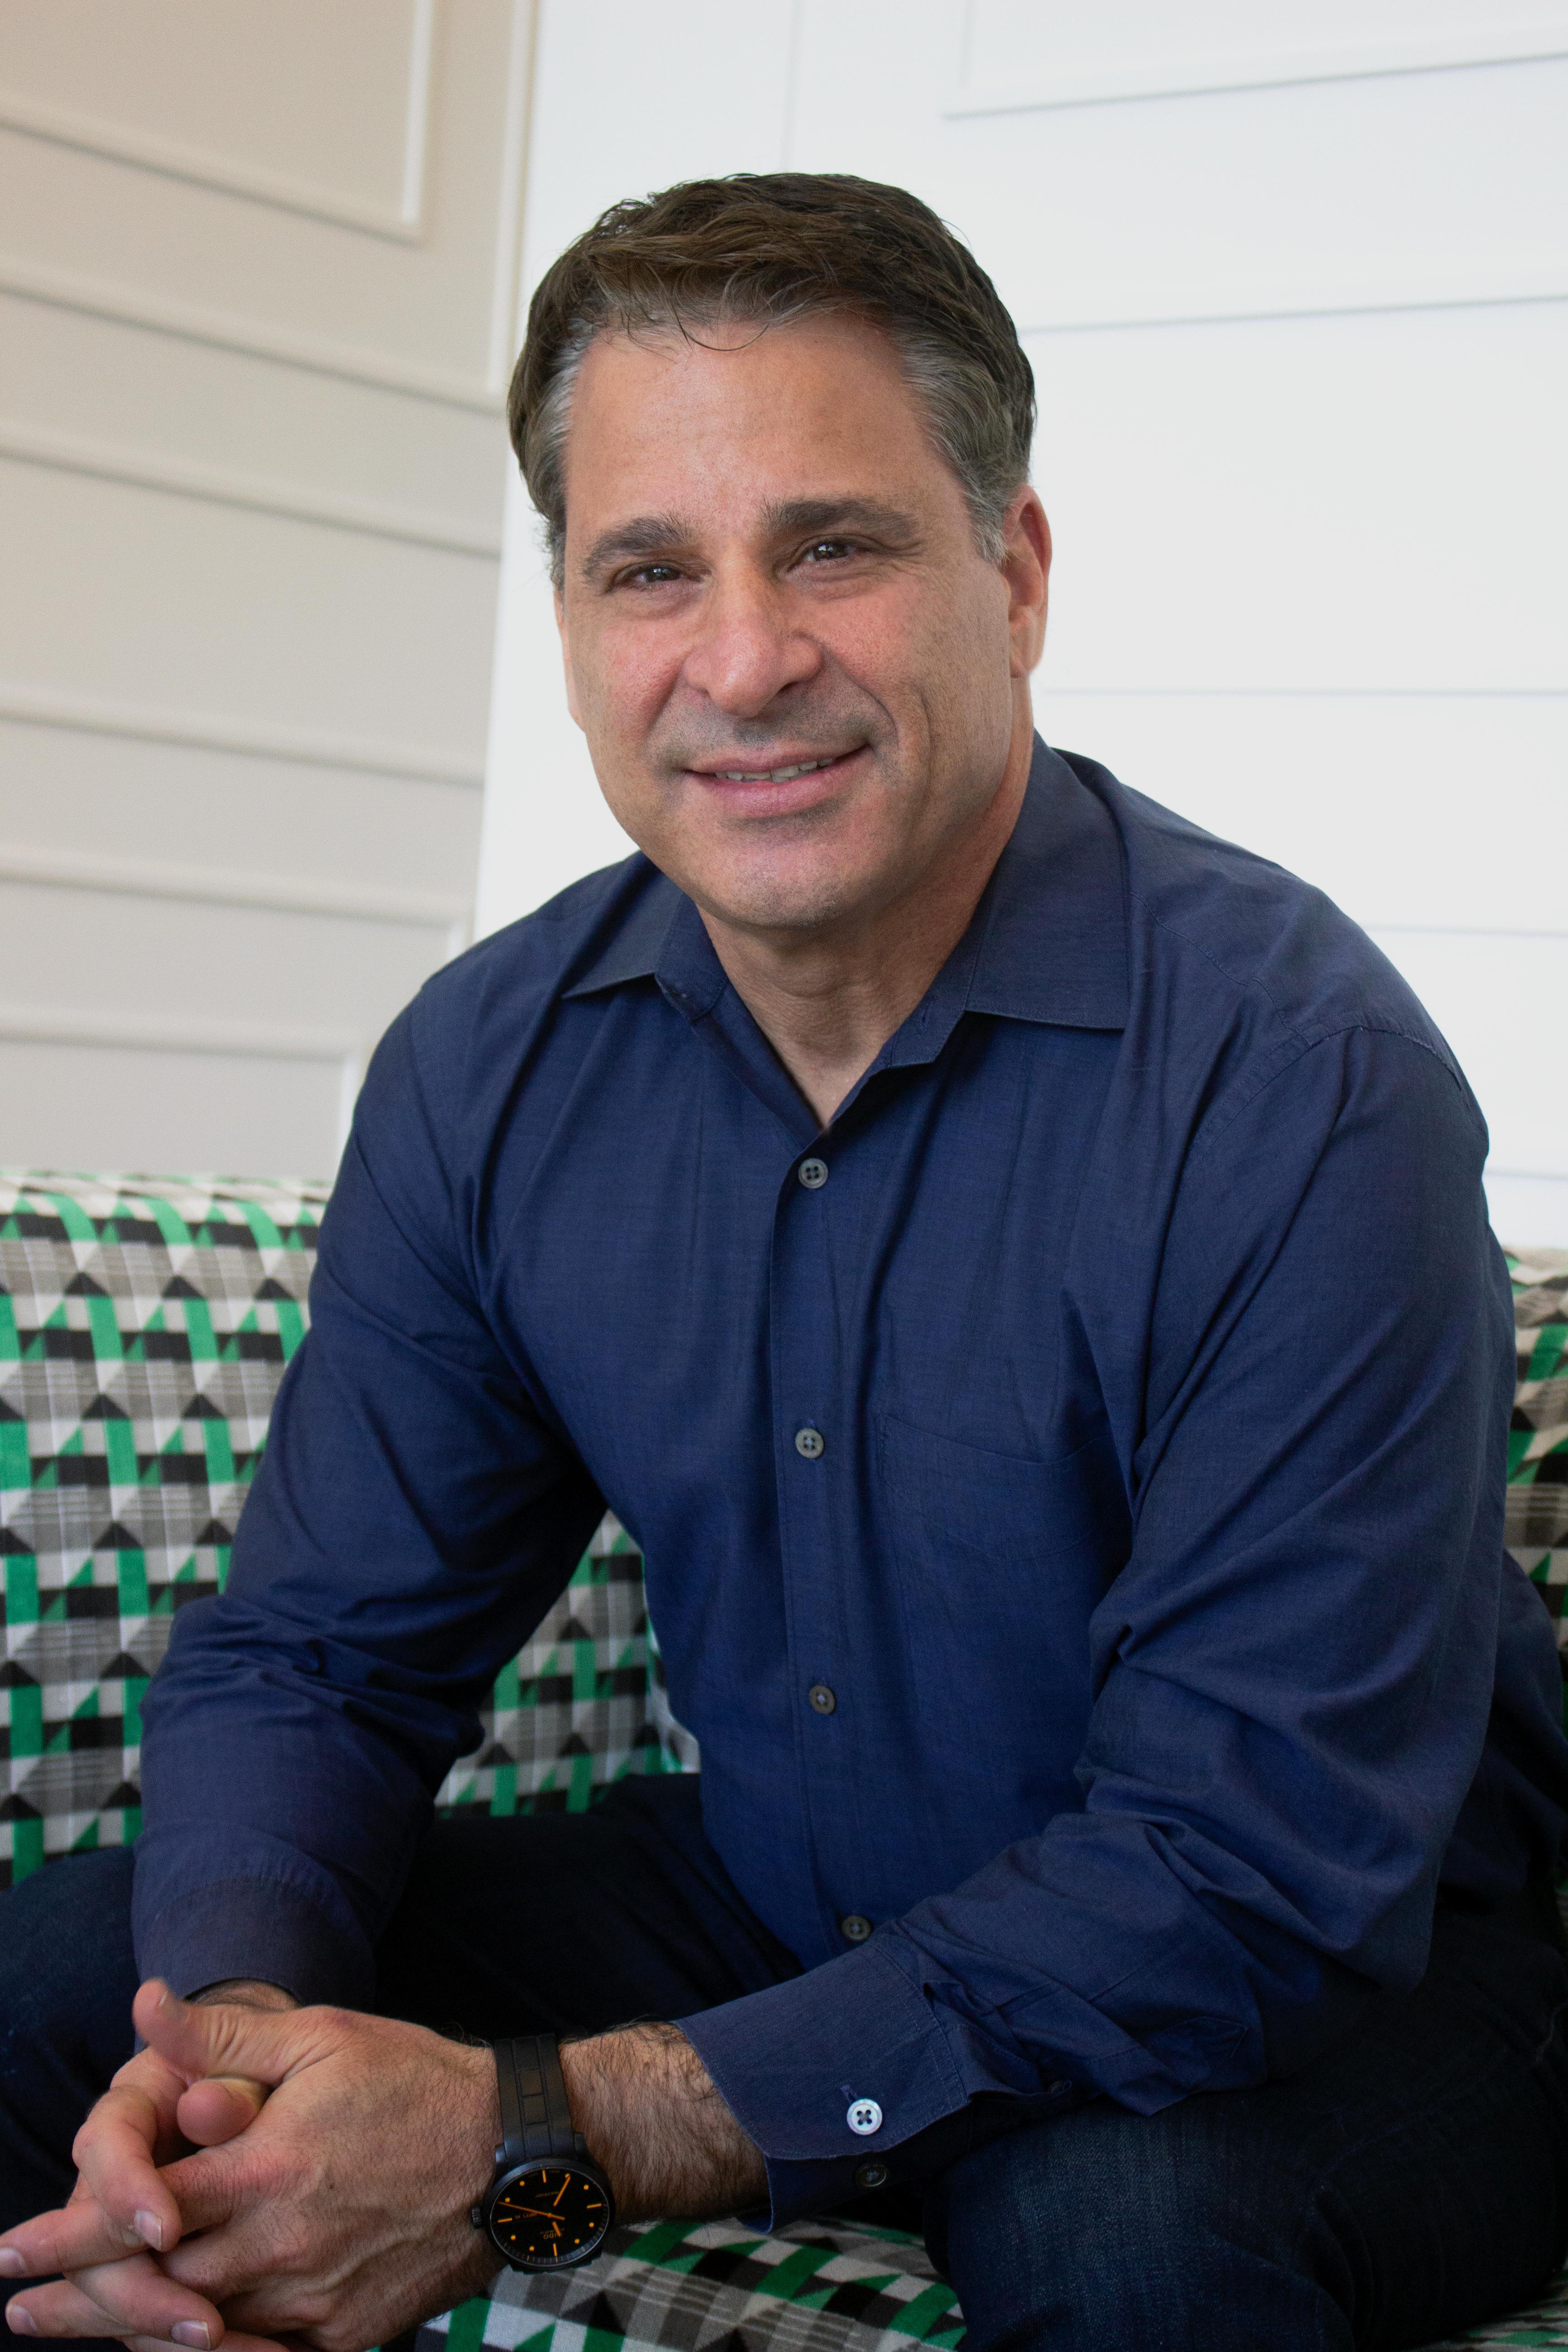 Mark Caplan